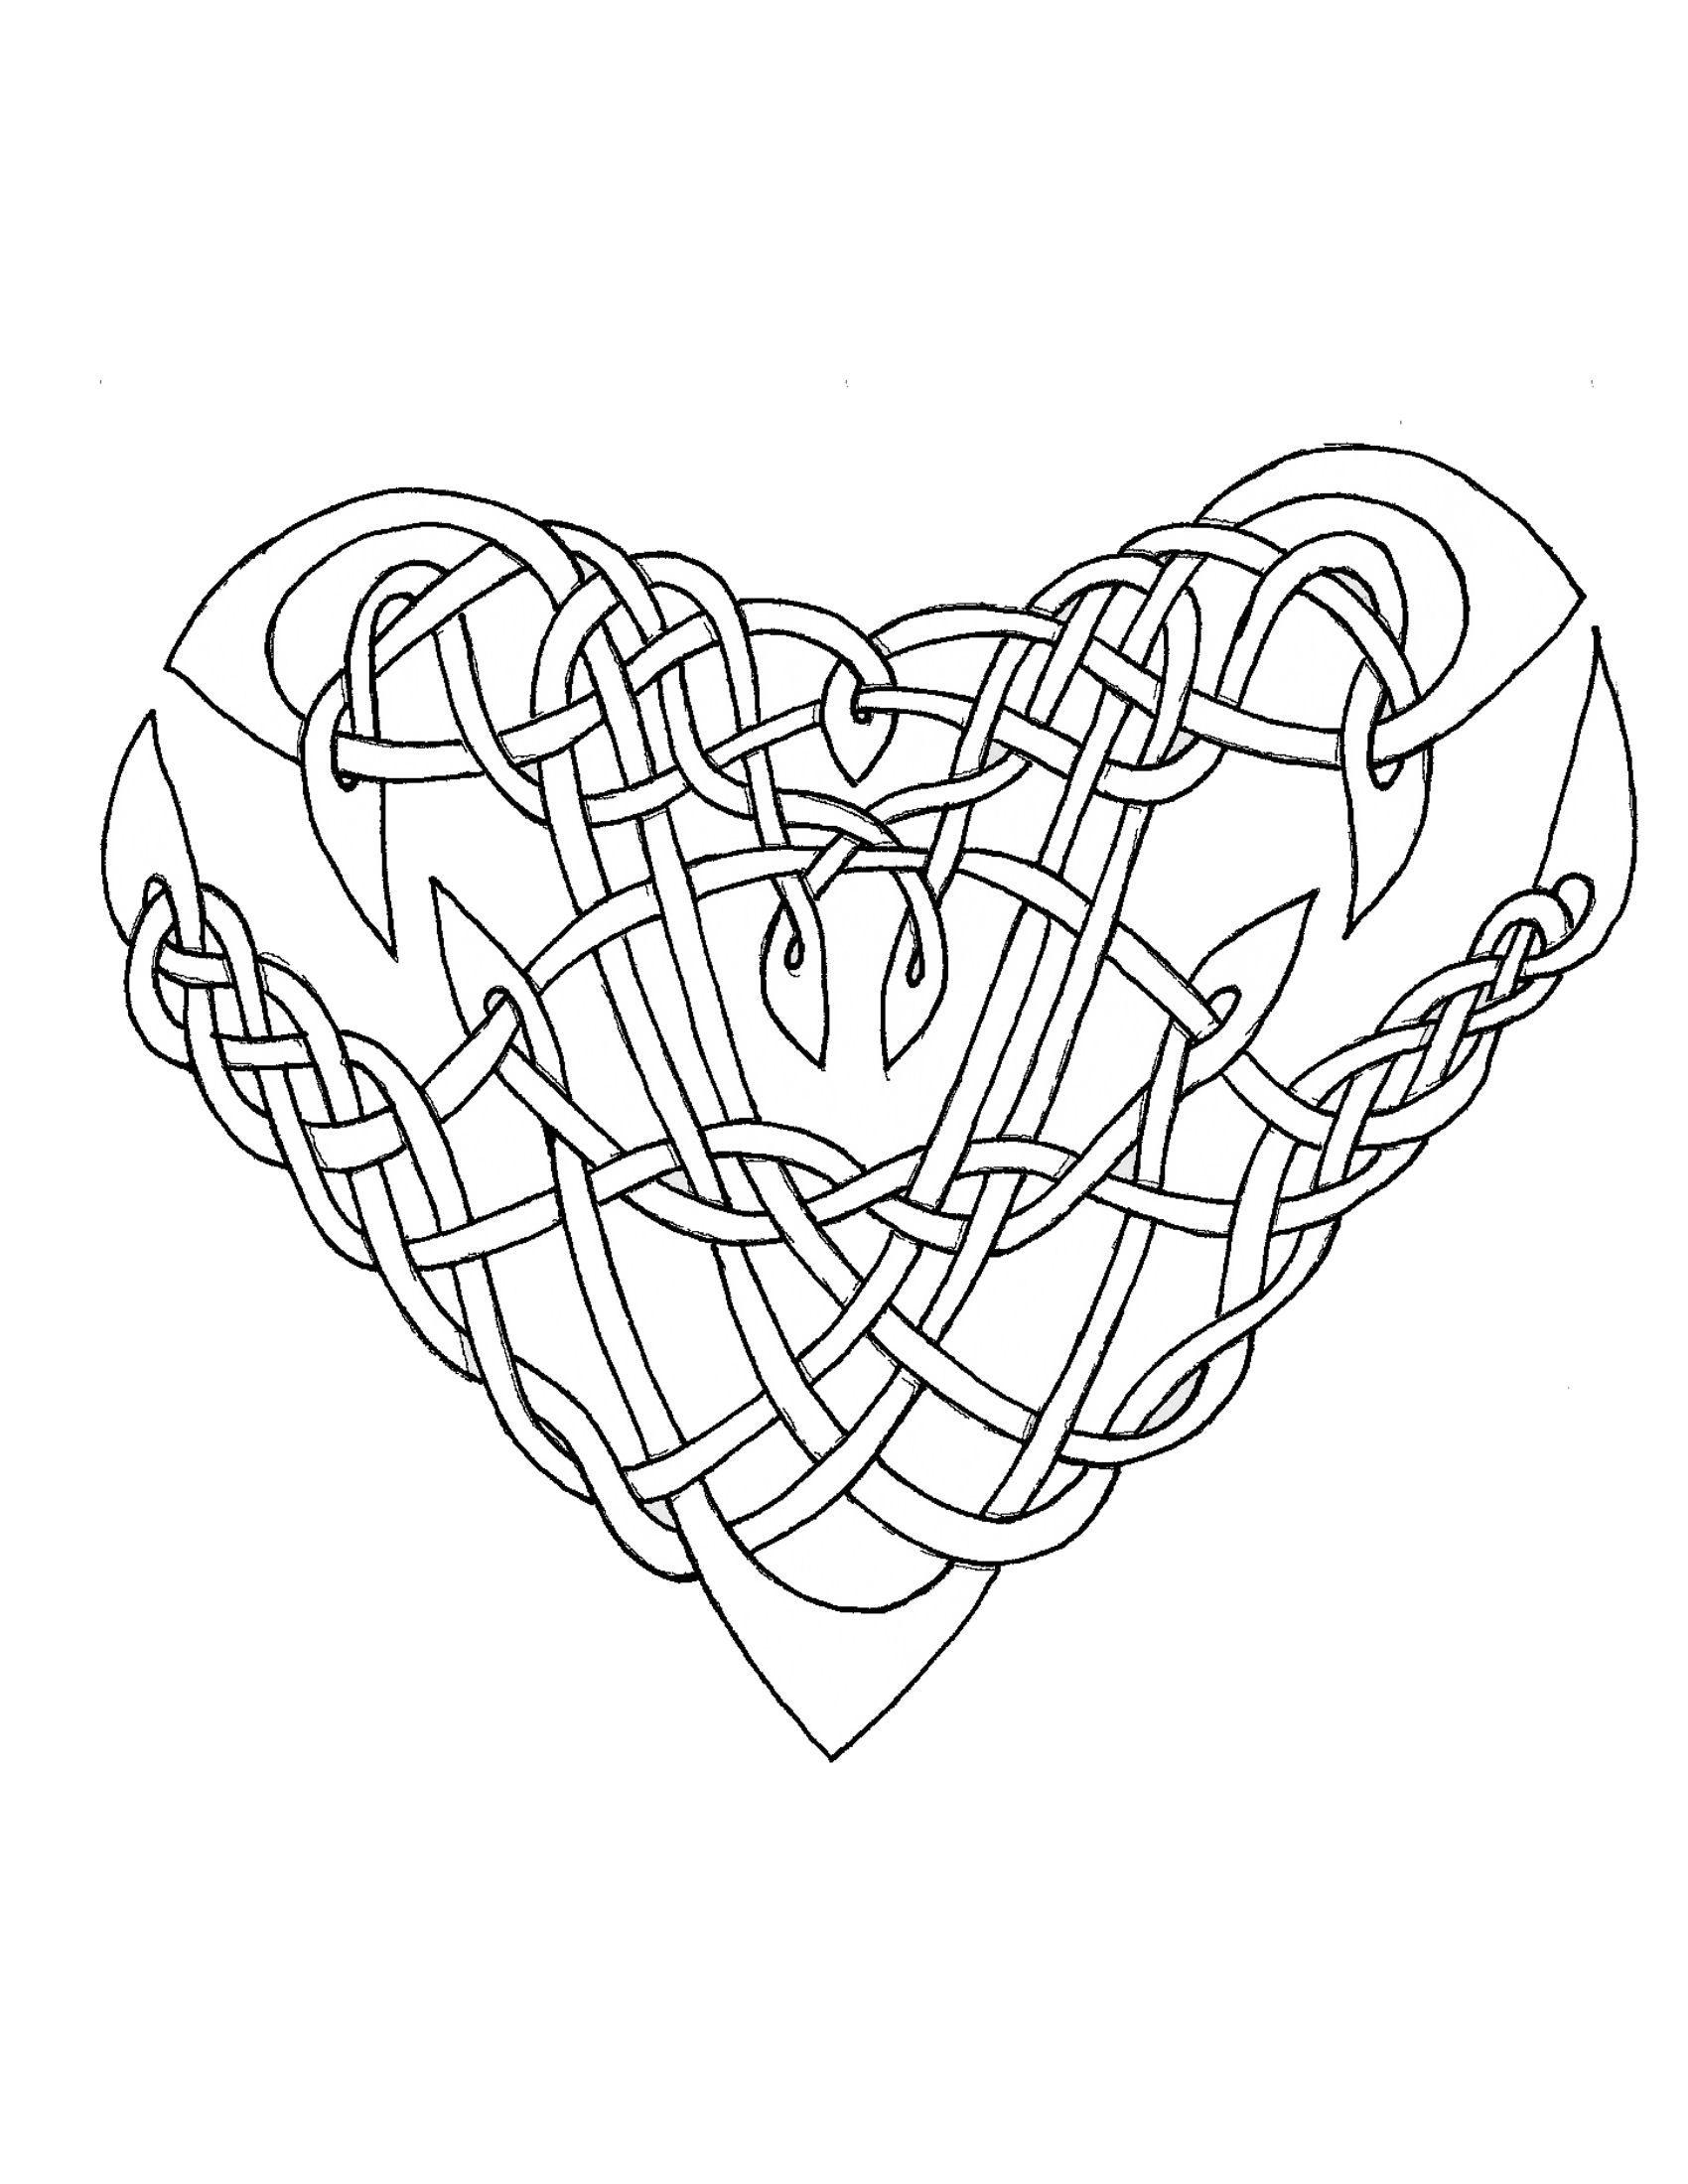 Pin de Judy Browning en Hearts | Pinterest | Español, Tarjetas y Joya